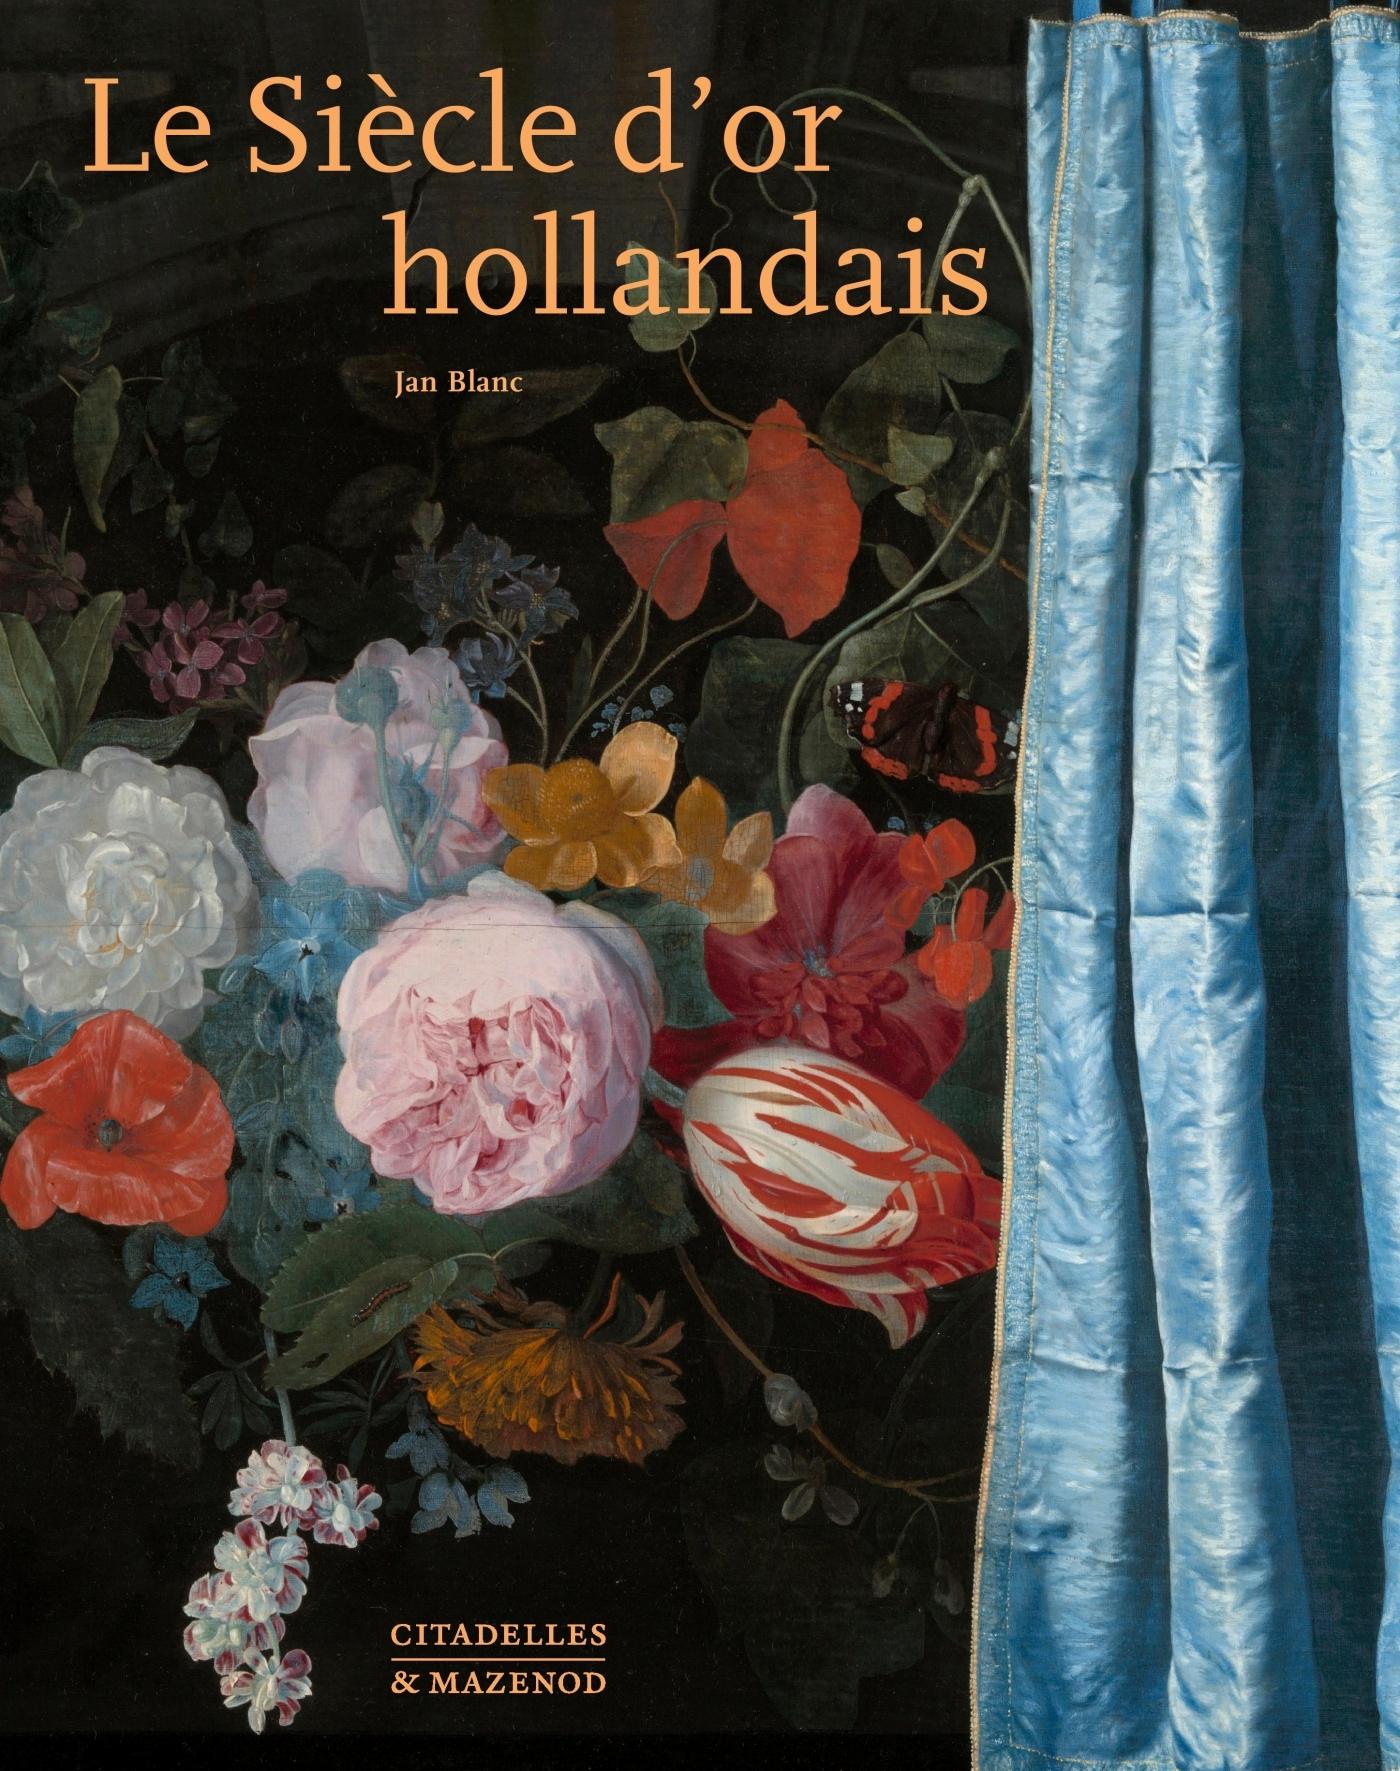 LE SIECLE D'OR HOLLANDAIS